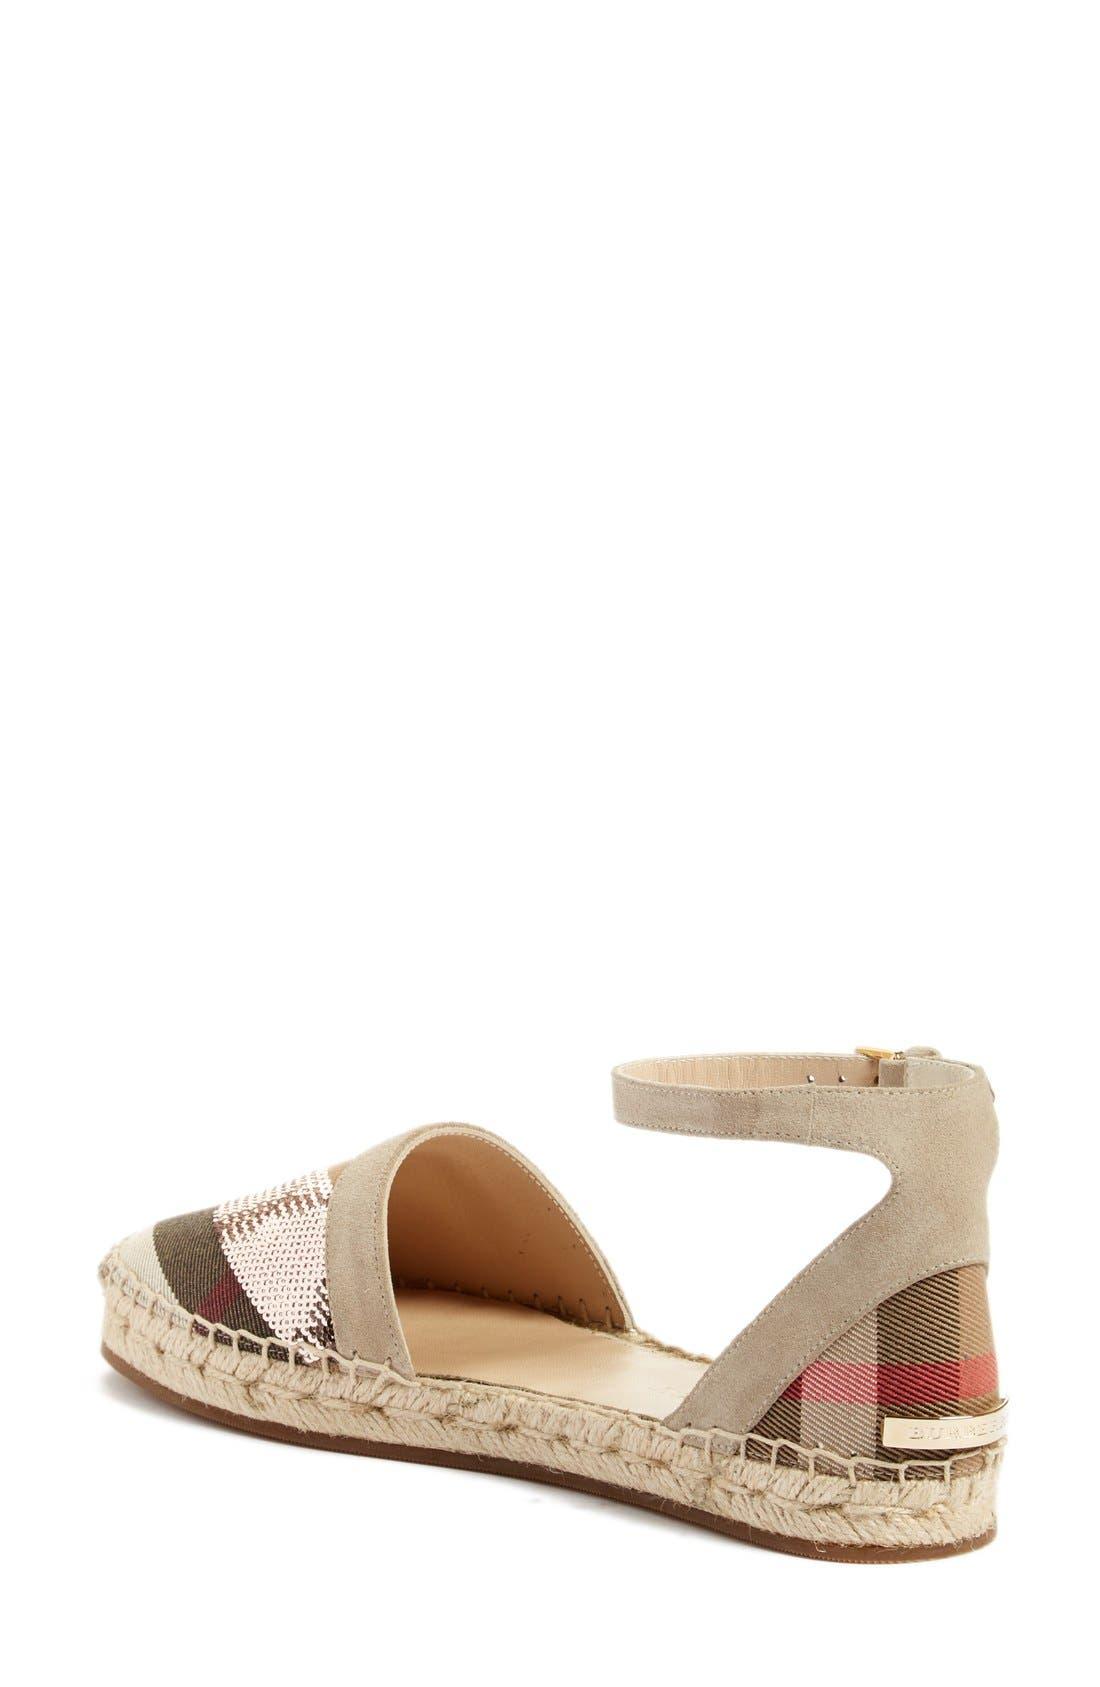 'Abbingdon' Ankle Strap Espadrille Sandal,                             Alternate thumbnail 2, color,                             Grey/ Pale Pink